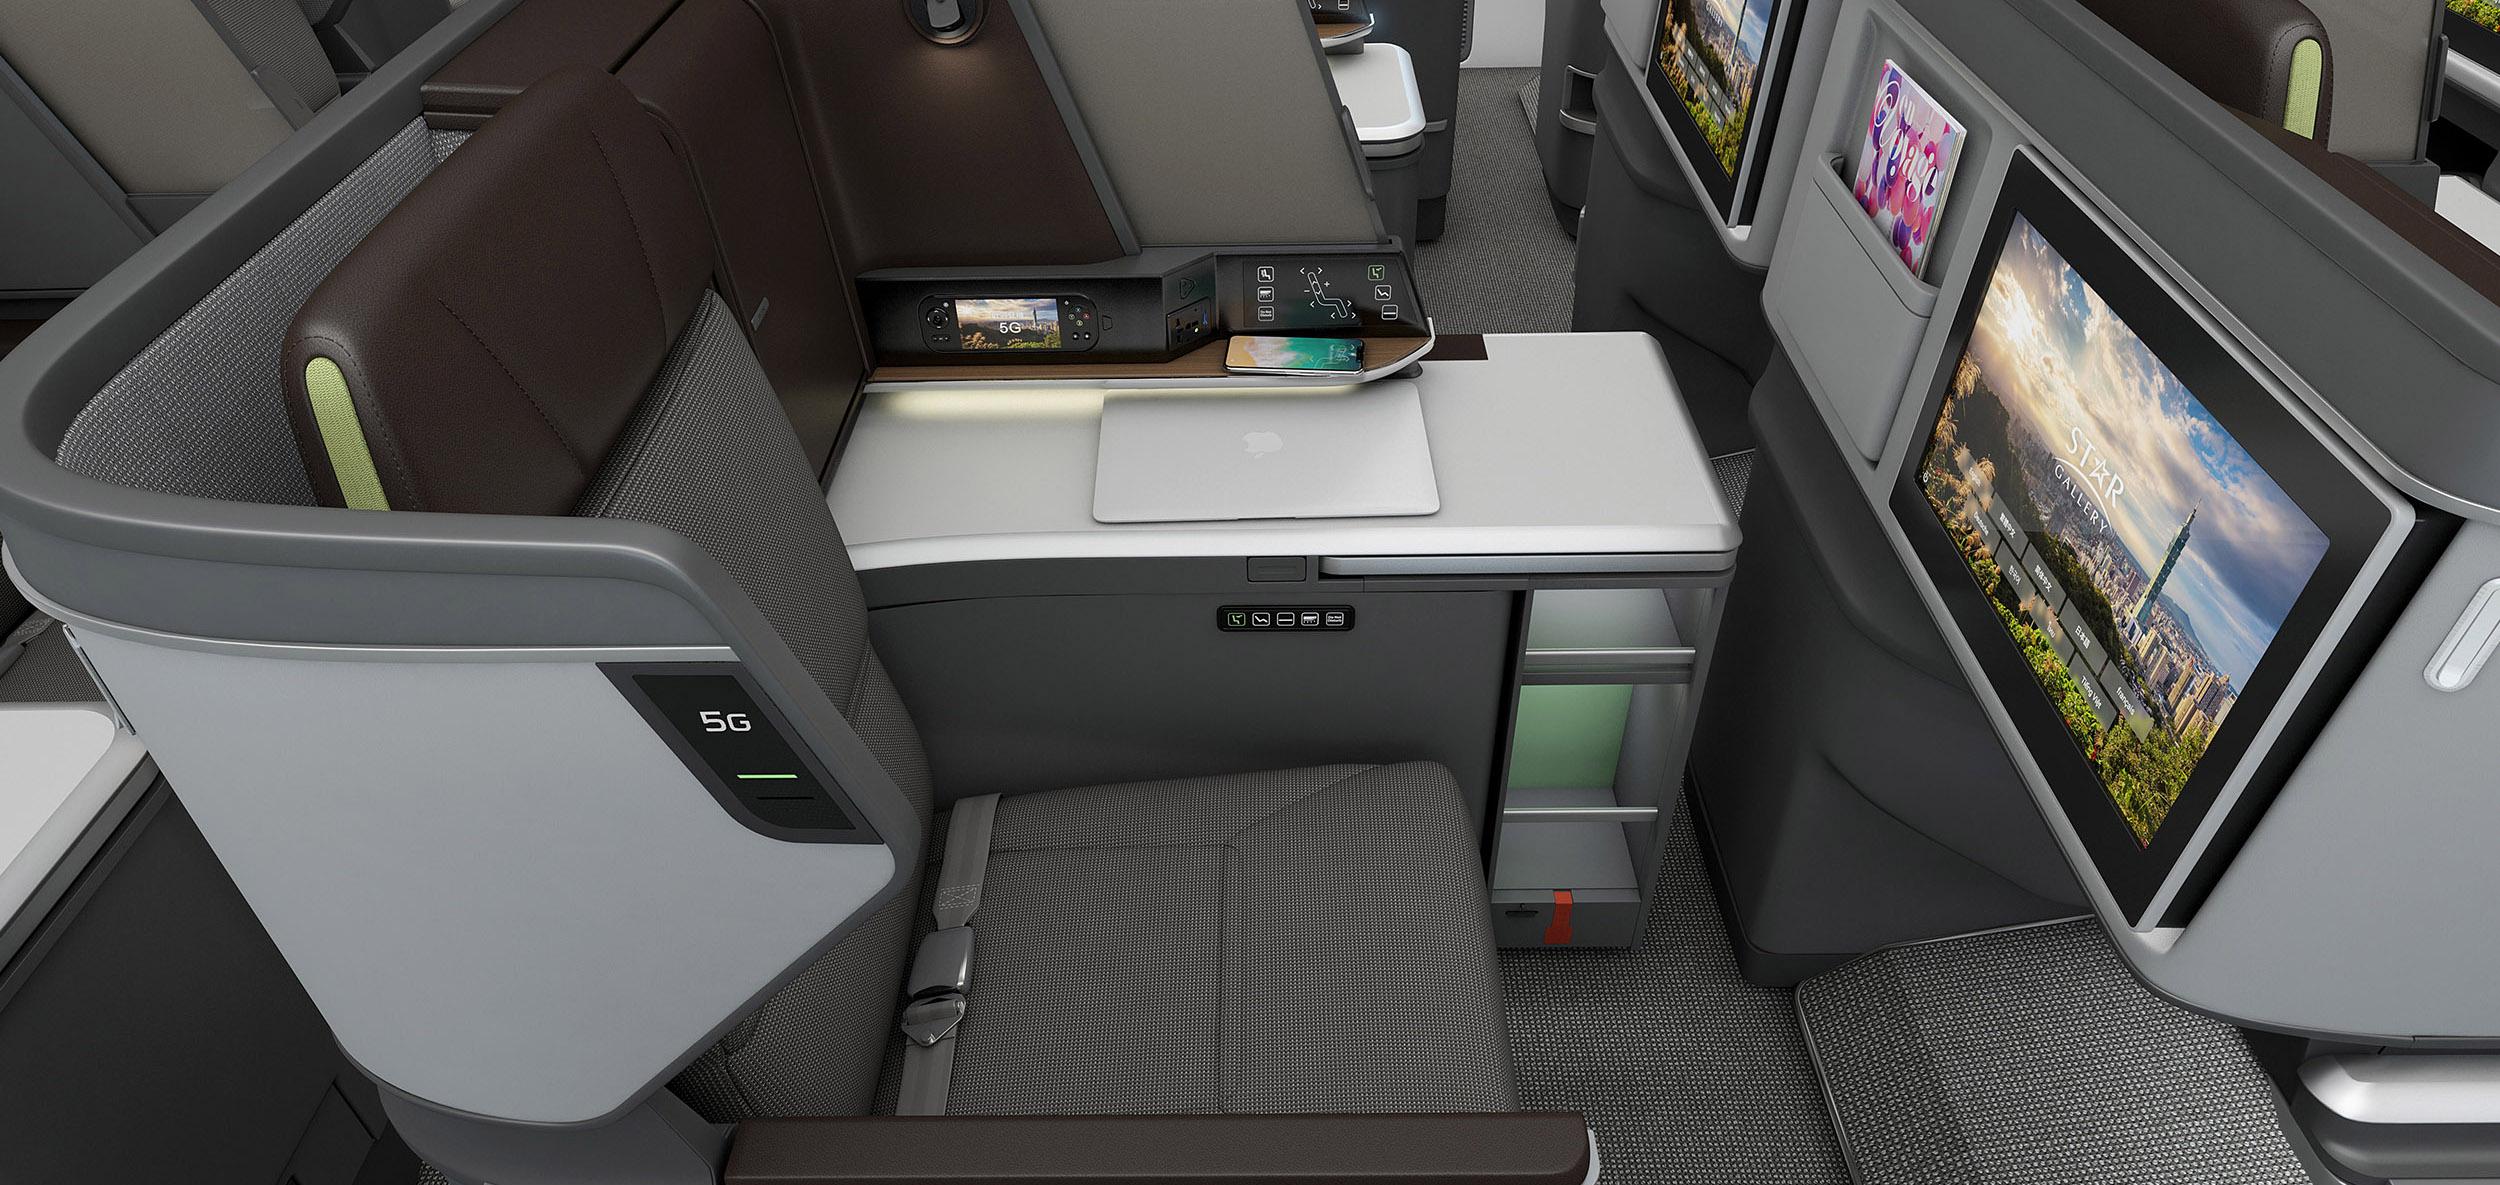 eva air seat